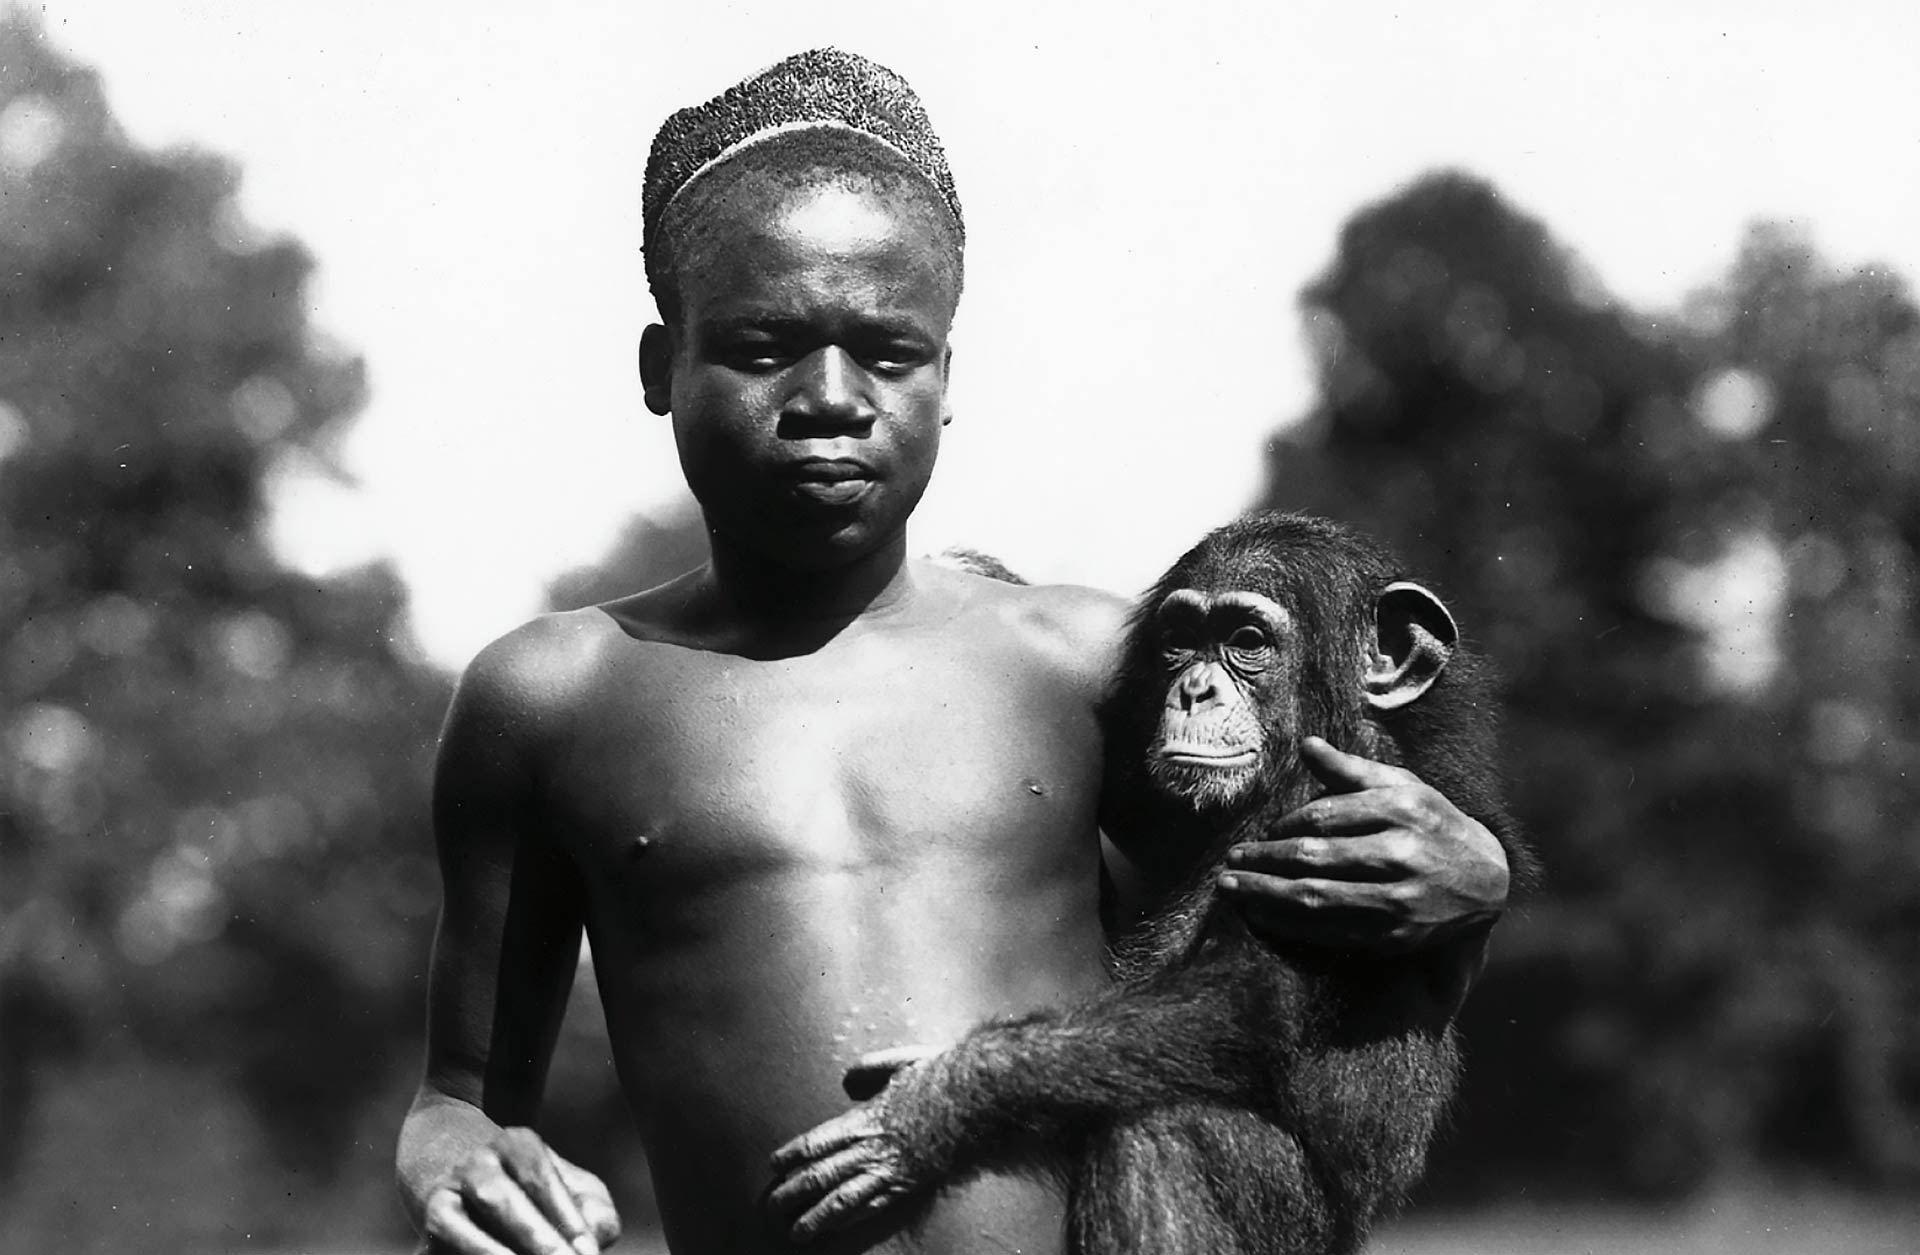 Le périple d'Ota Benga dans les zoos humains